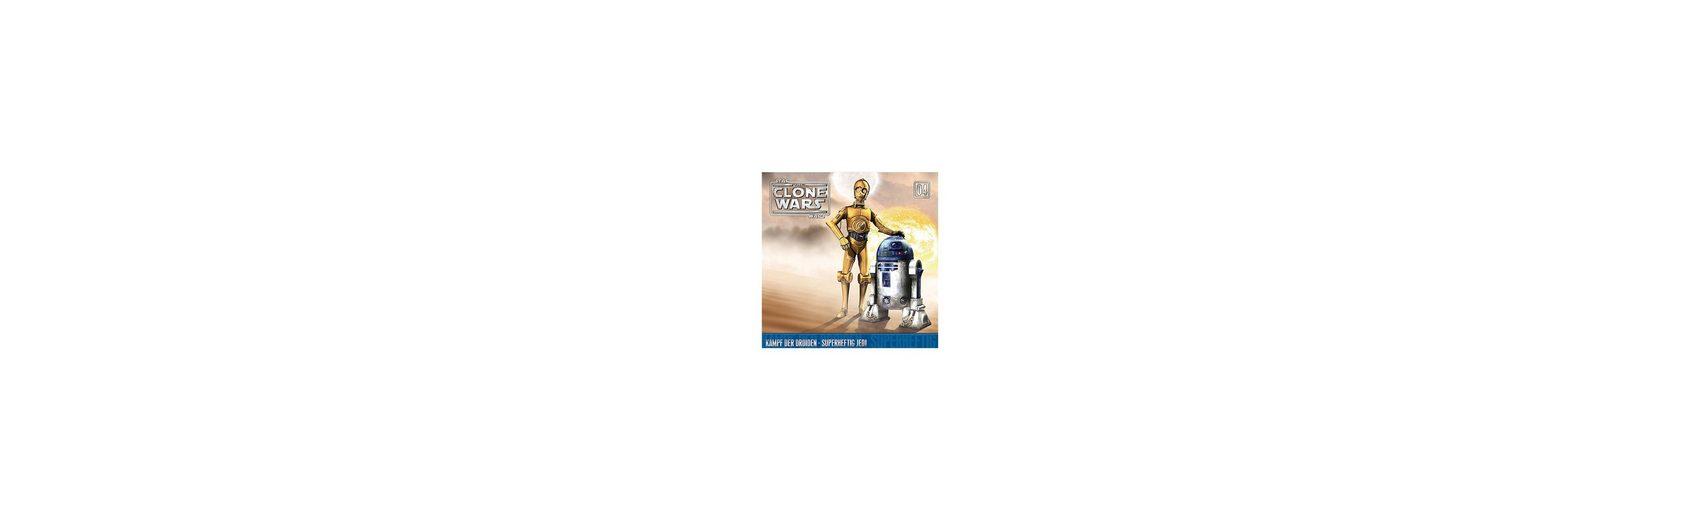 Universal Music GmbH CD Star Wars - The Clone Wars 04 - Kampf der Droiden